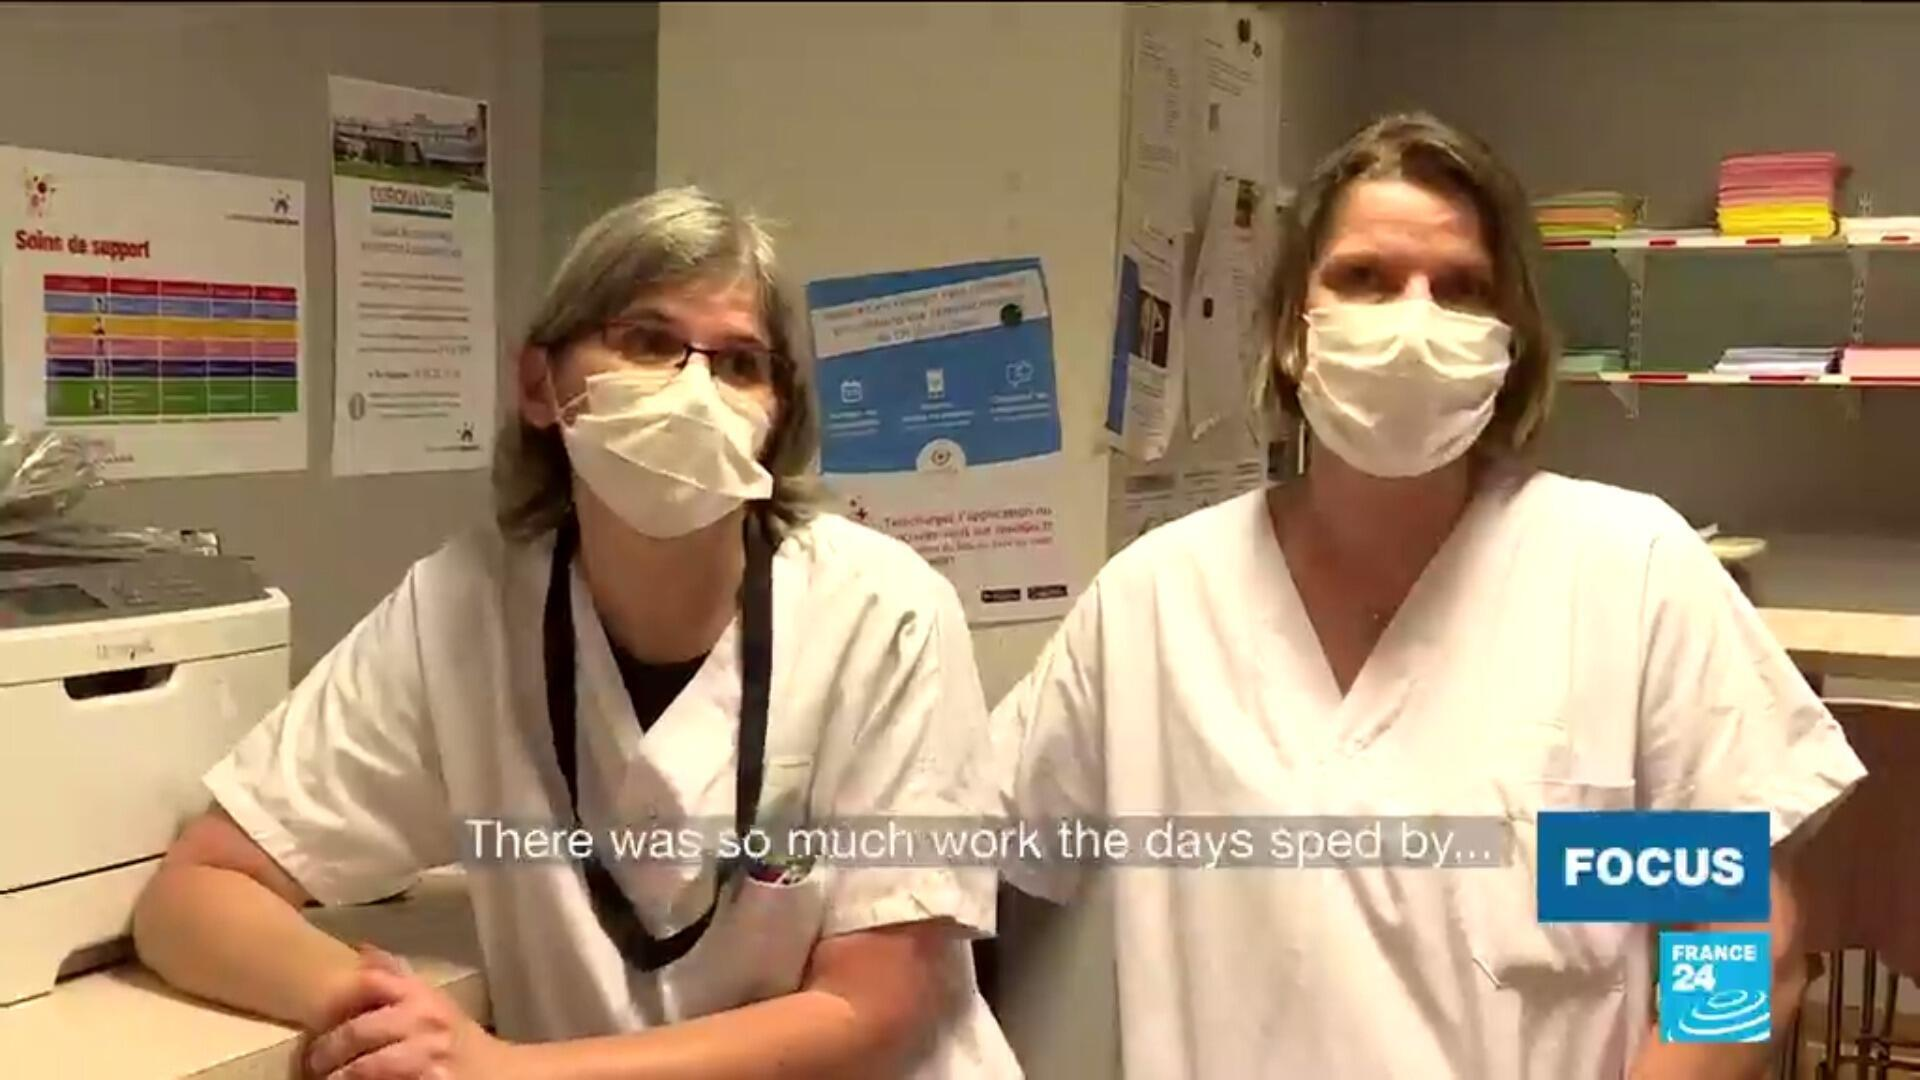 FOCUS 2 nurses Paris hospital